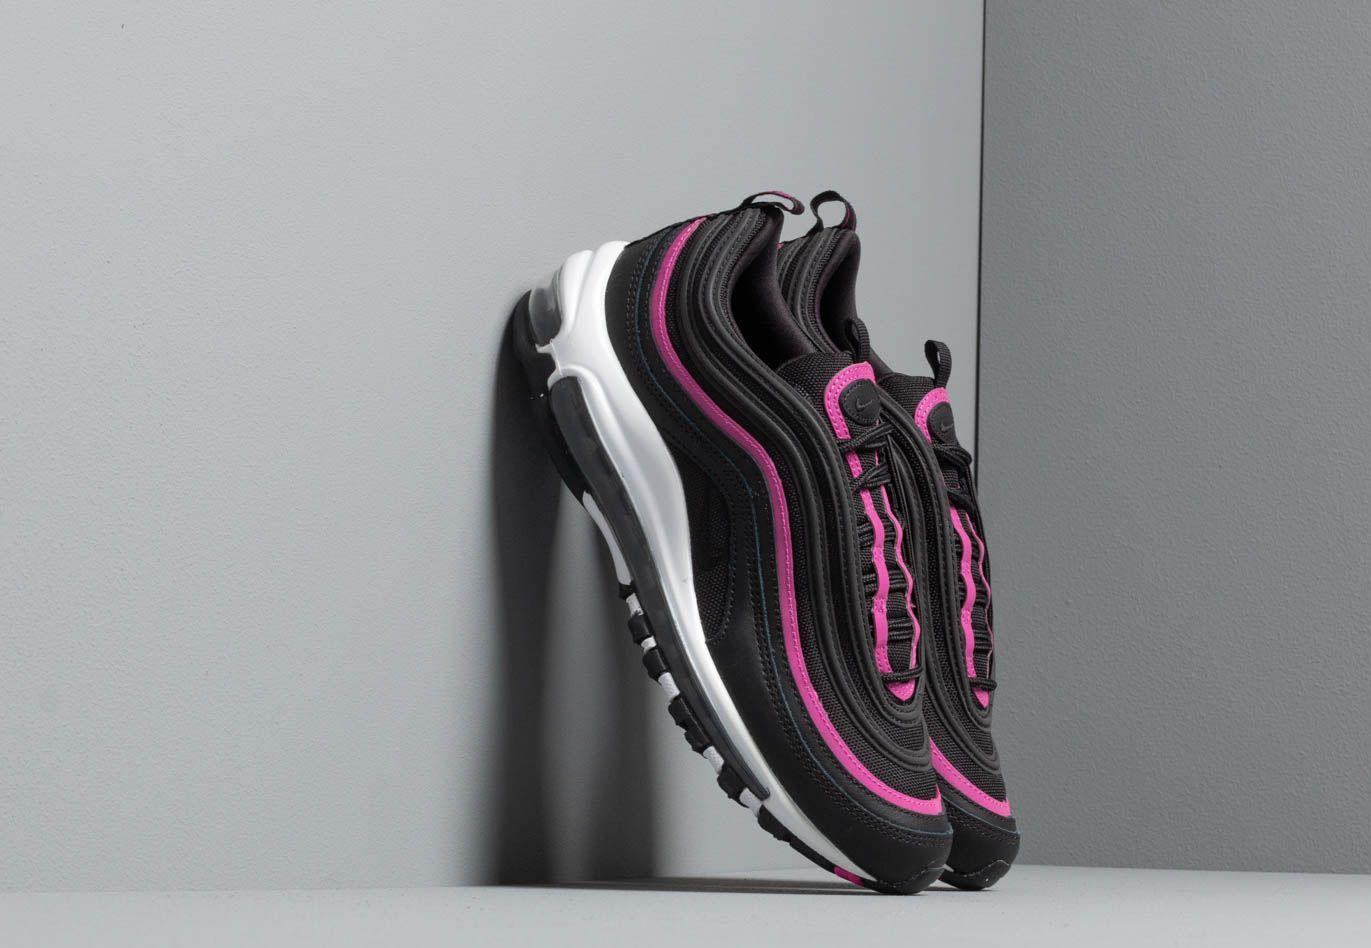 8e801db262e7 Lyst - Nike W Air Max 97 Lx Black  Black-active Fuchsia in Black